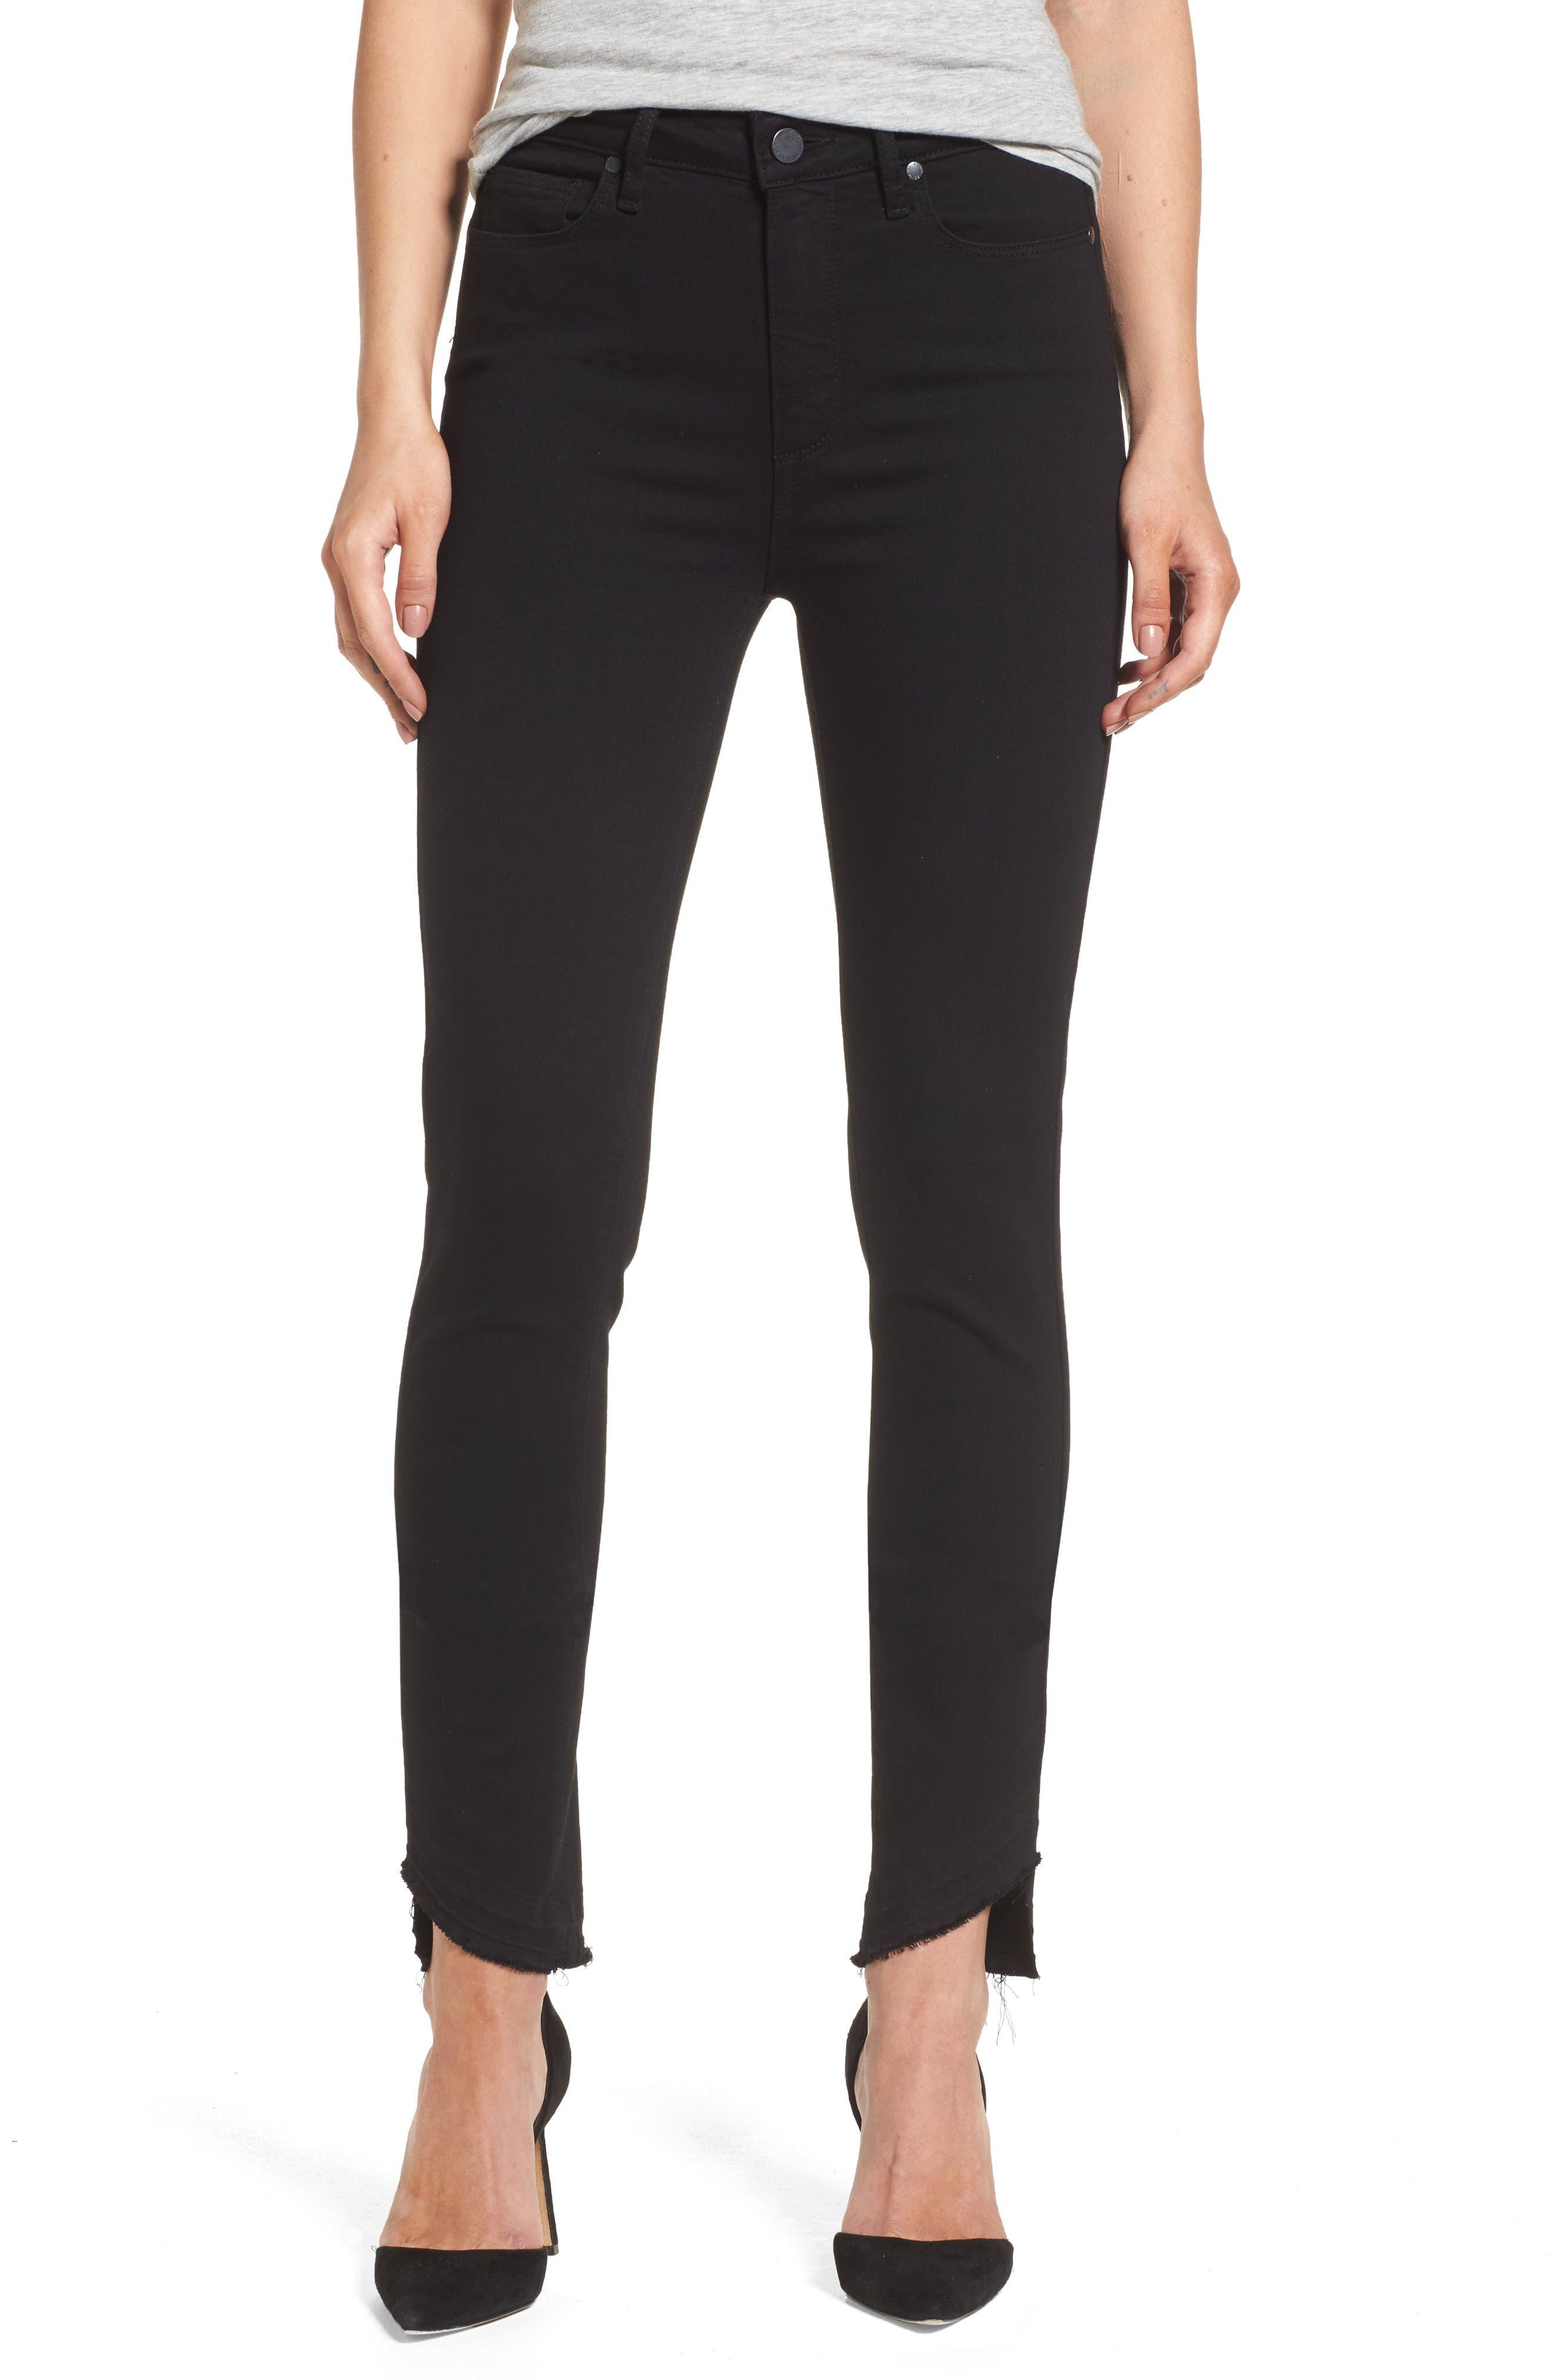 Main Image - PAIGE Transcend Hoxton High Waist Undone Hem Skinny Jeans (Black Shadow)